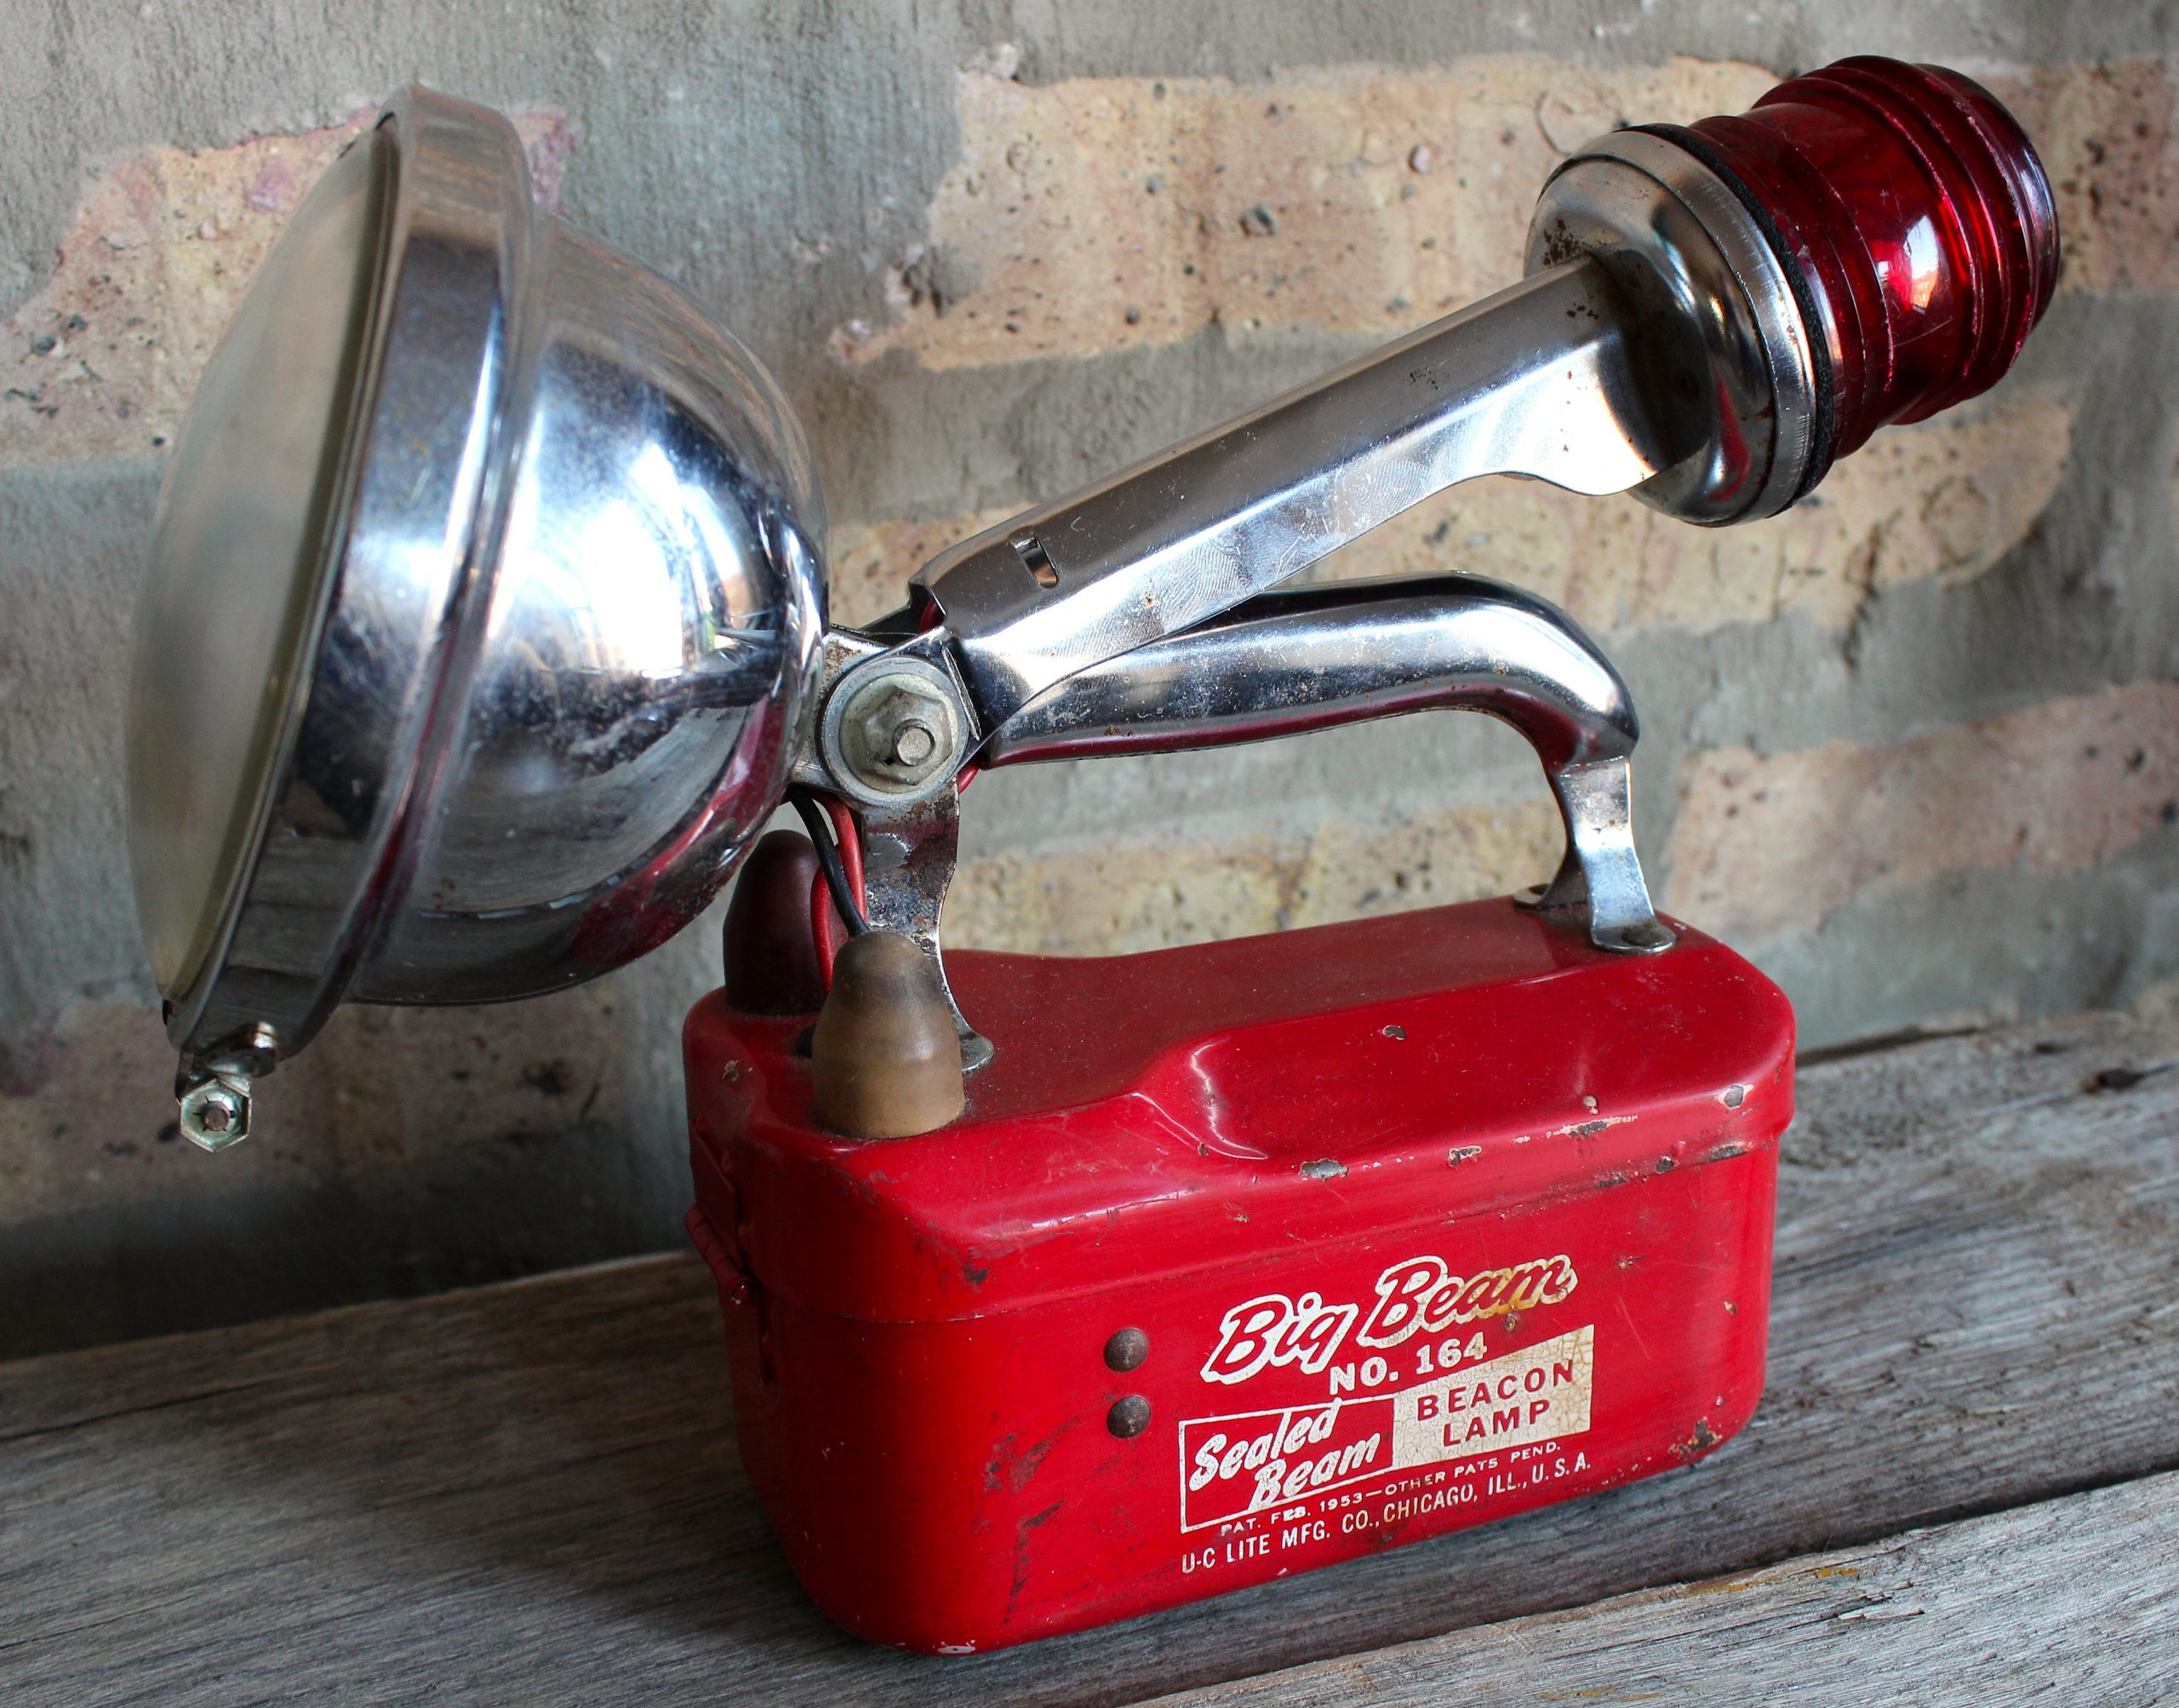 Big Beam No. 164 Beacon Lamp